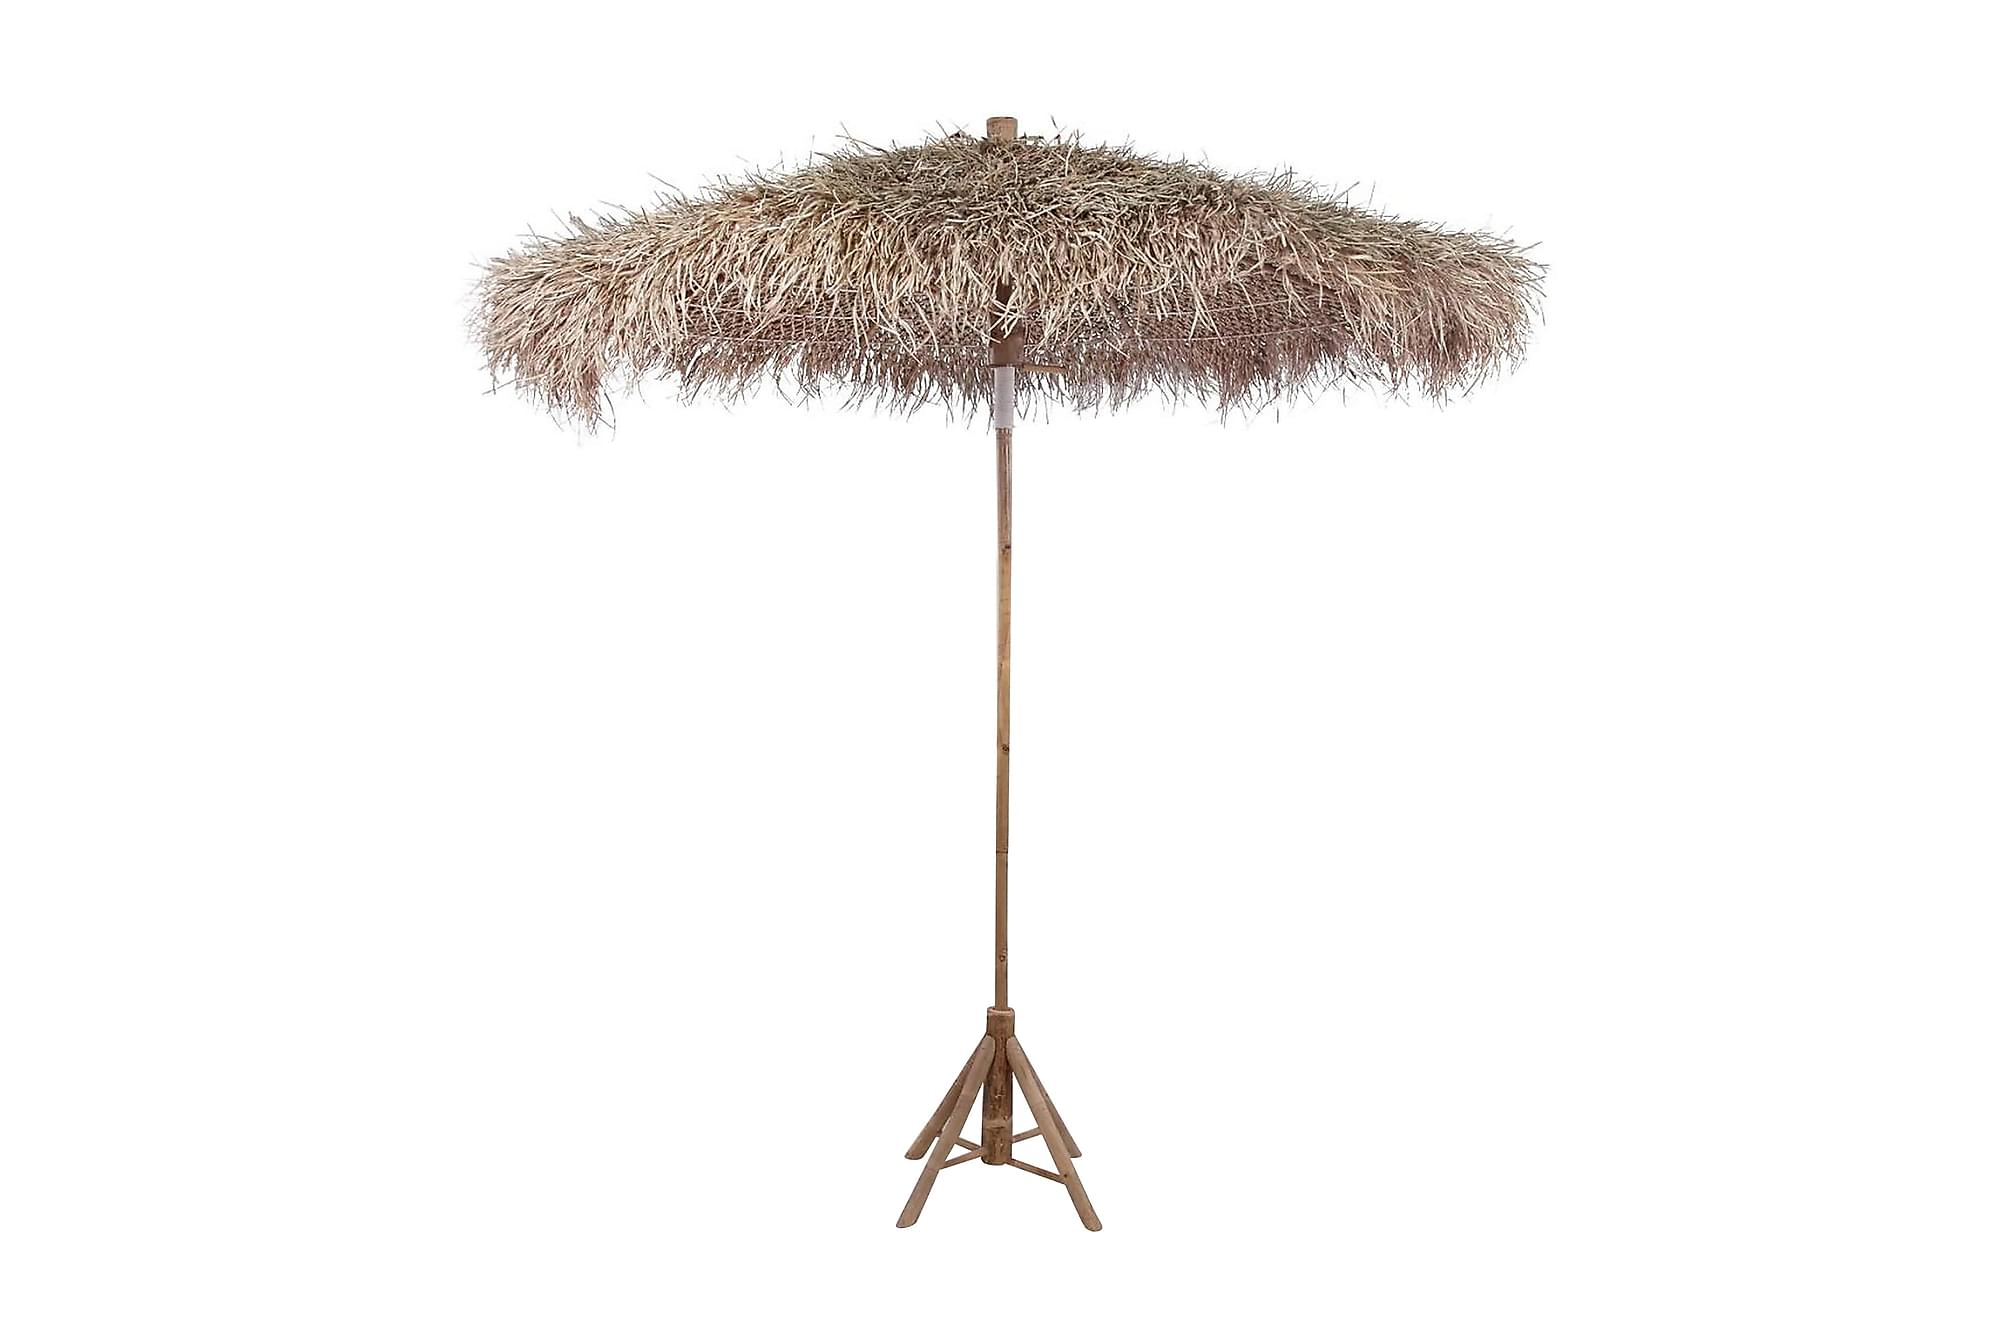 Bambuparasoll med bananbladstak 270 cm, Parasoll